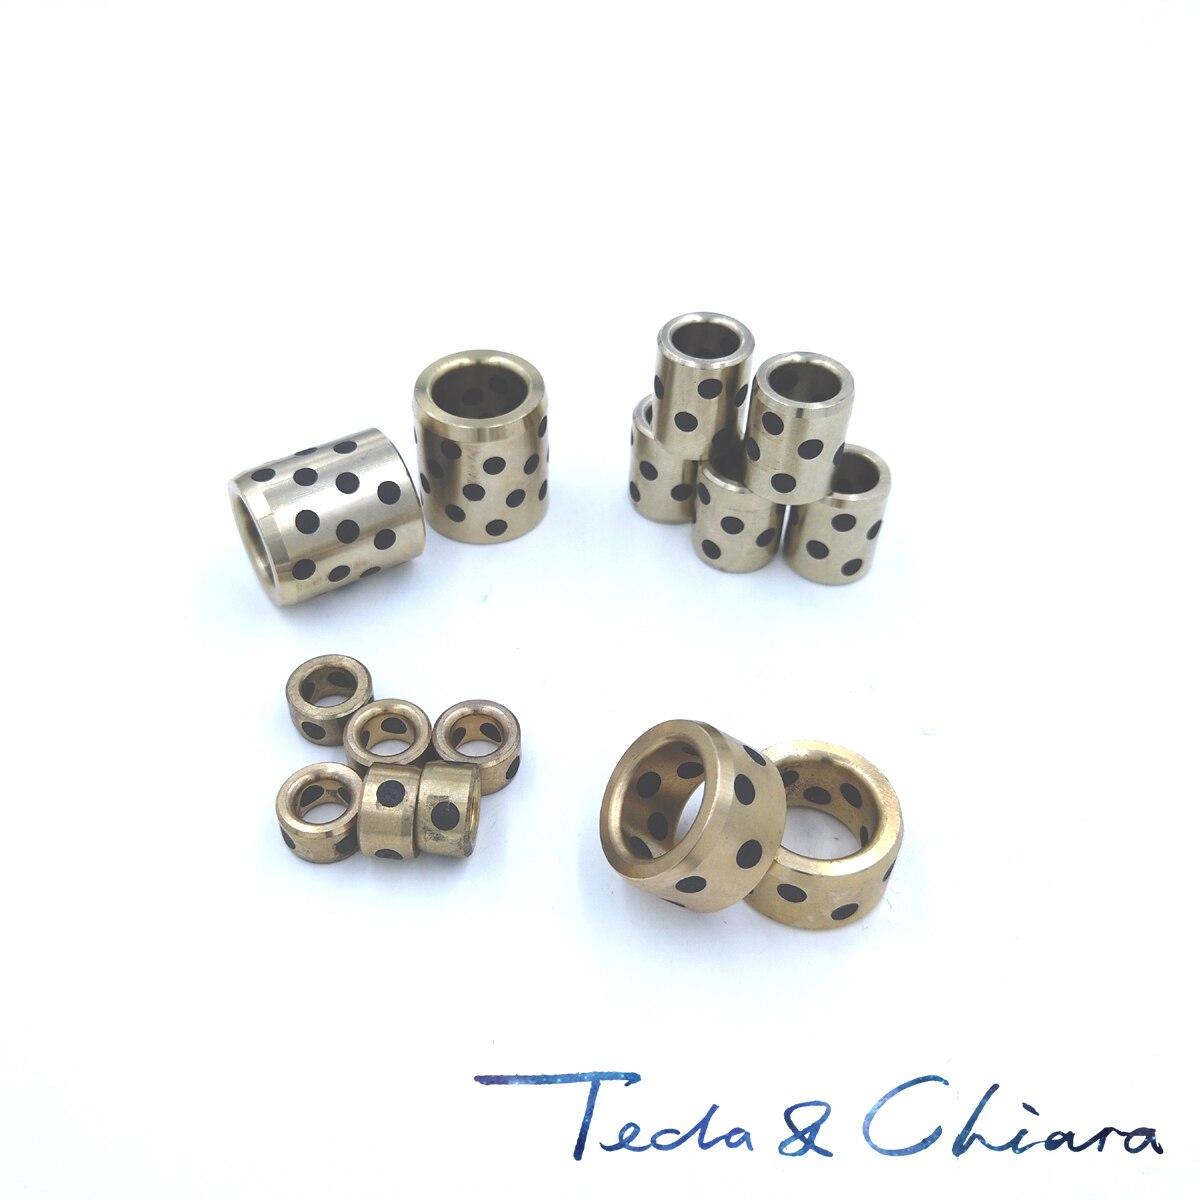 JDB 101410 101412 101415 101420 Graphite Lubricating Brass Bearing Bushing Sleeve Oilless 10 x 14 x 10 12 15 20mm